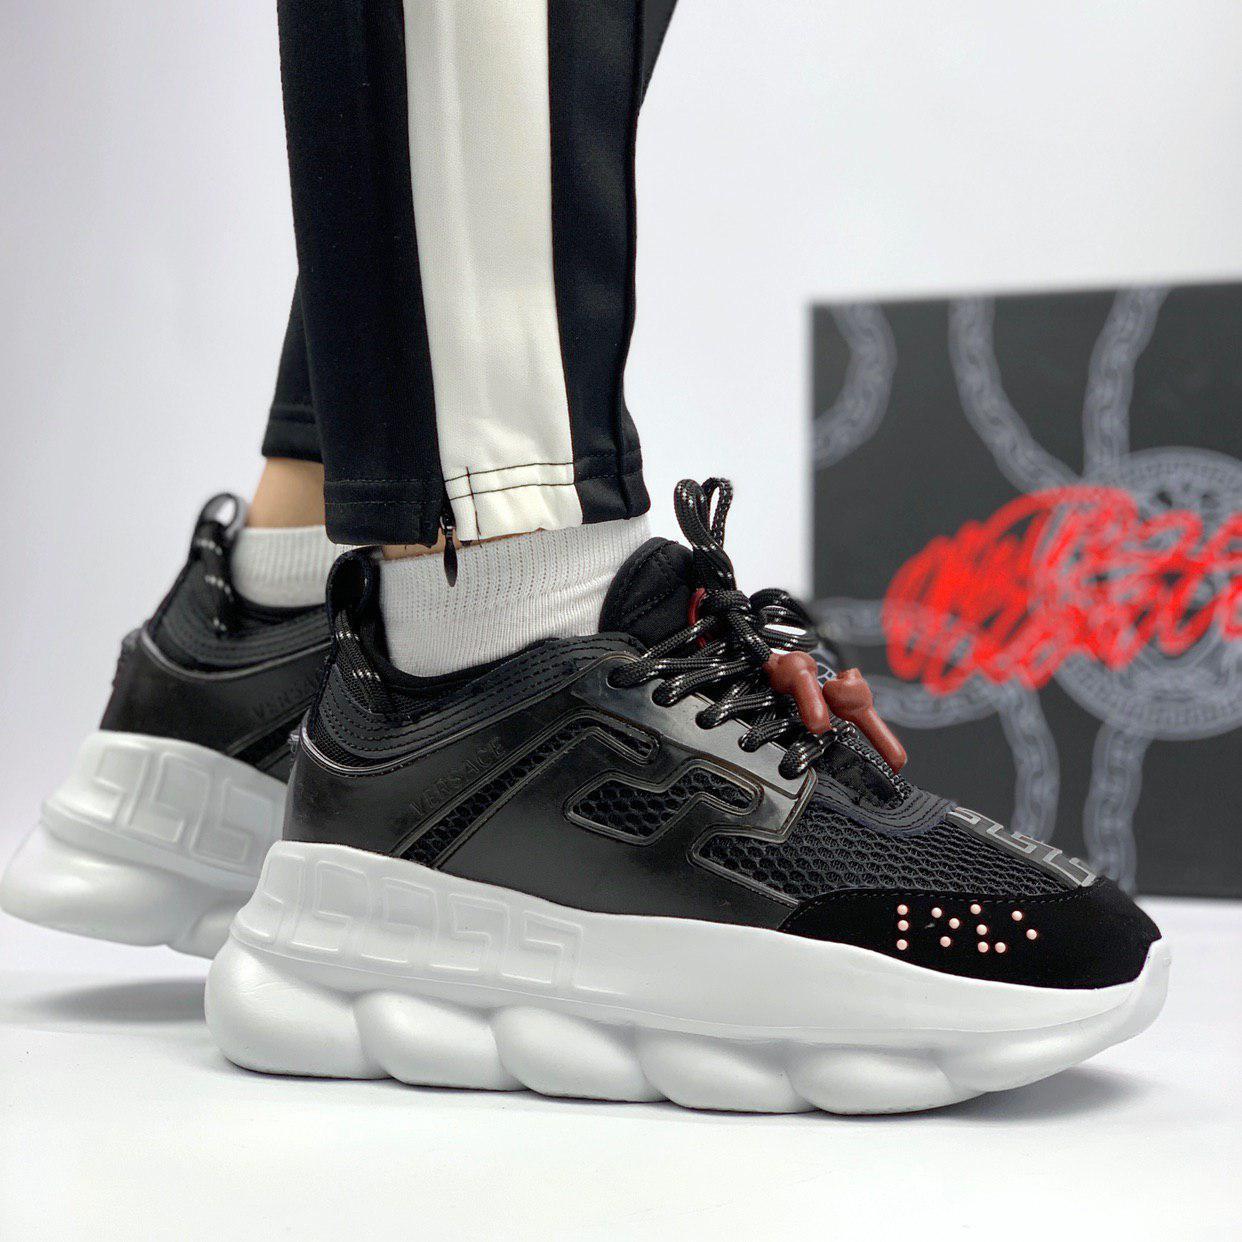 Женские кроссовки в стиле Versace Chain Reaction Black/White